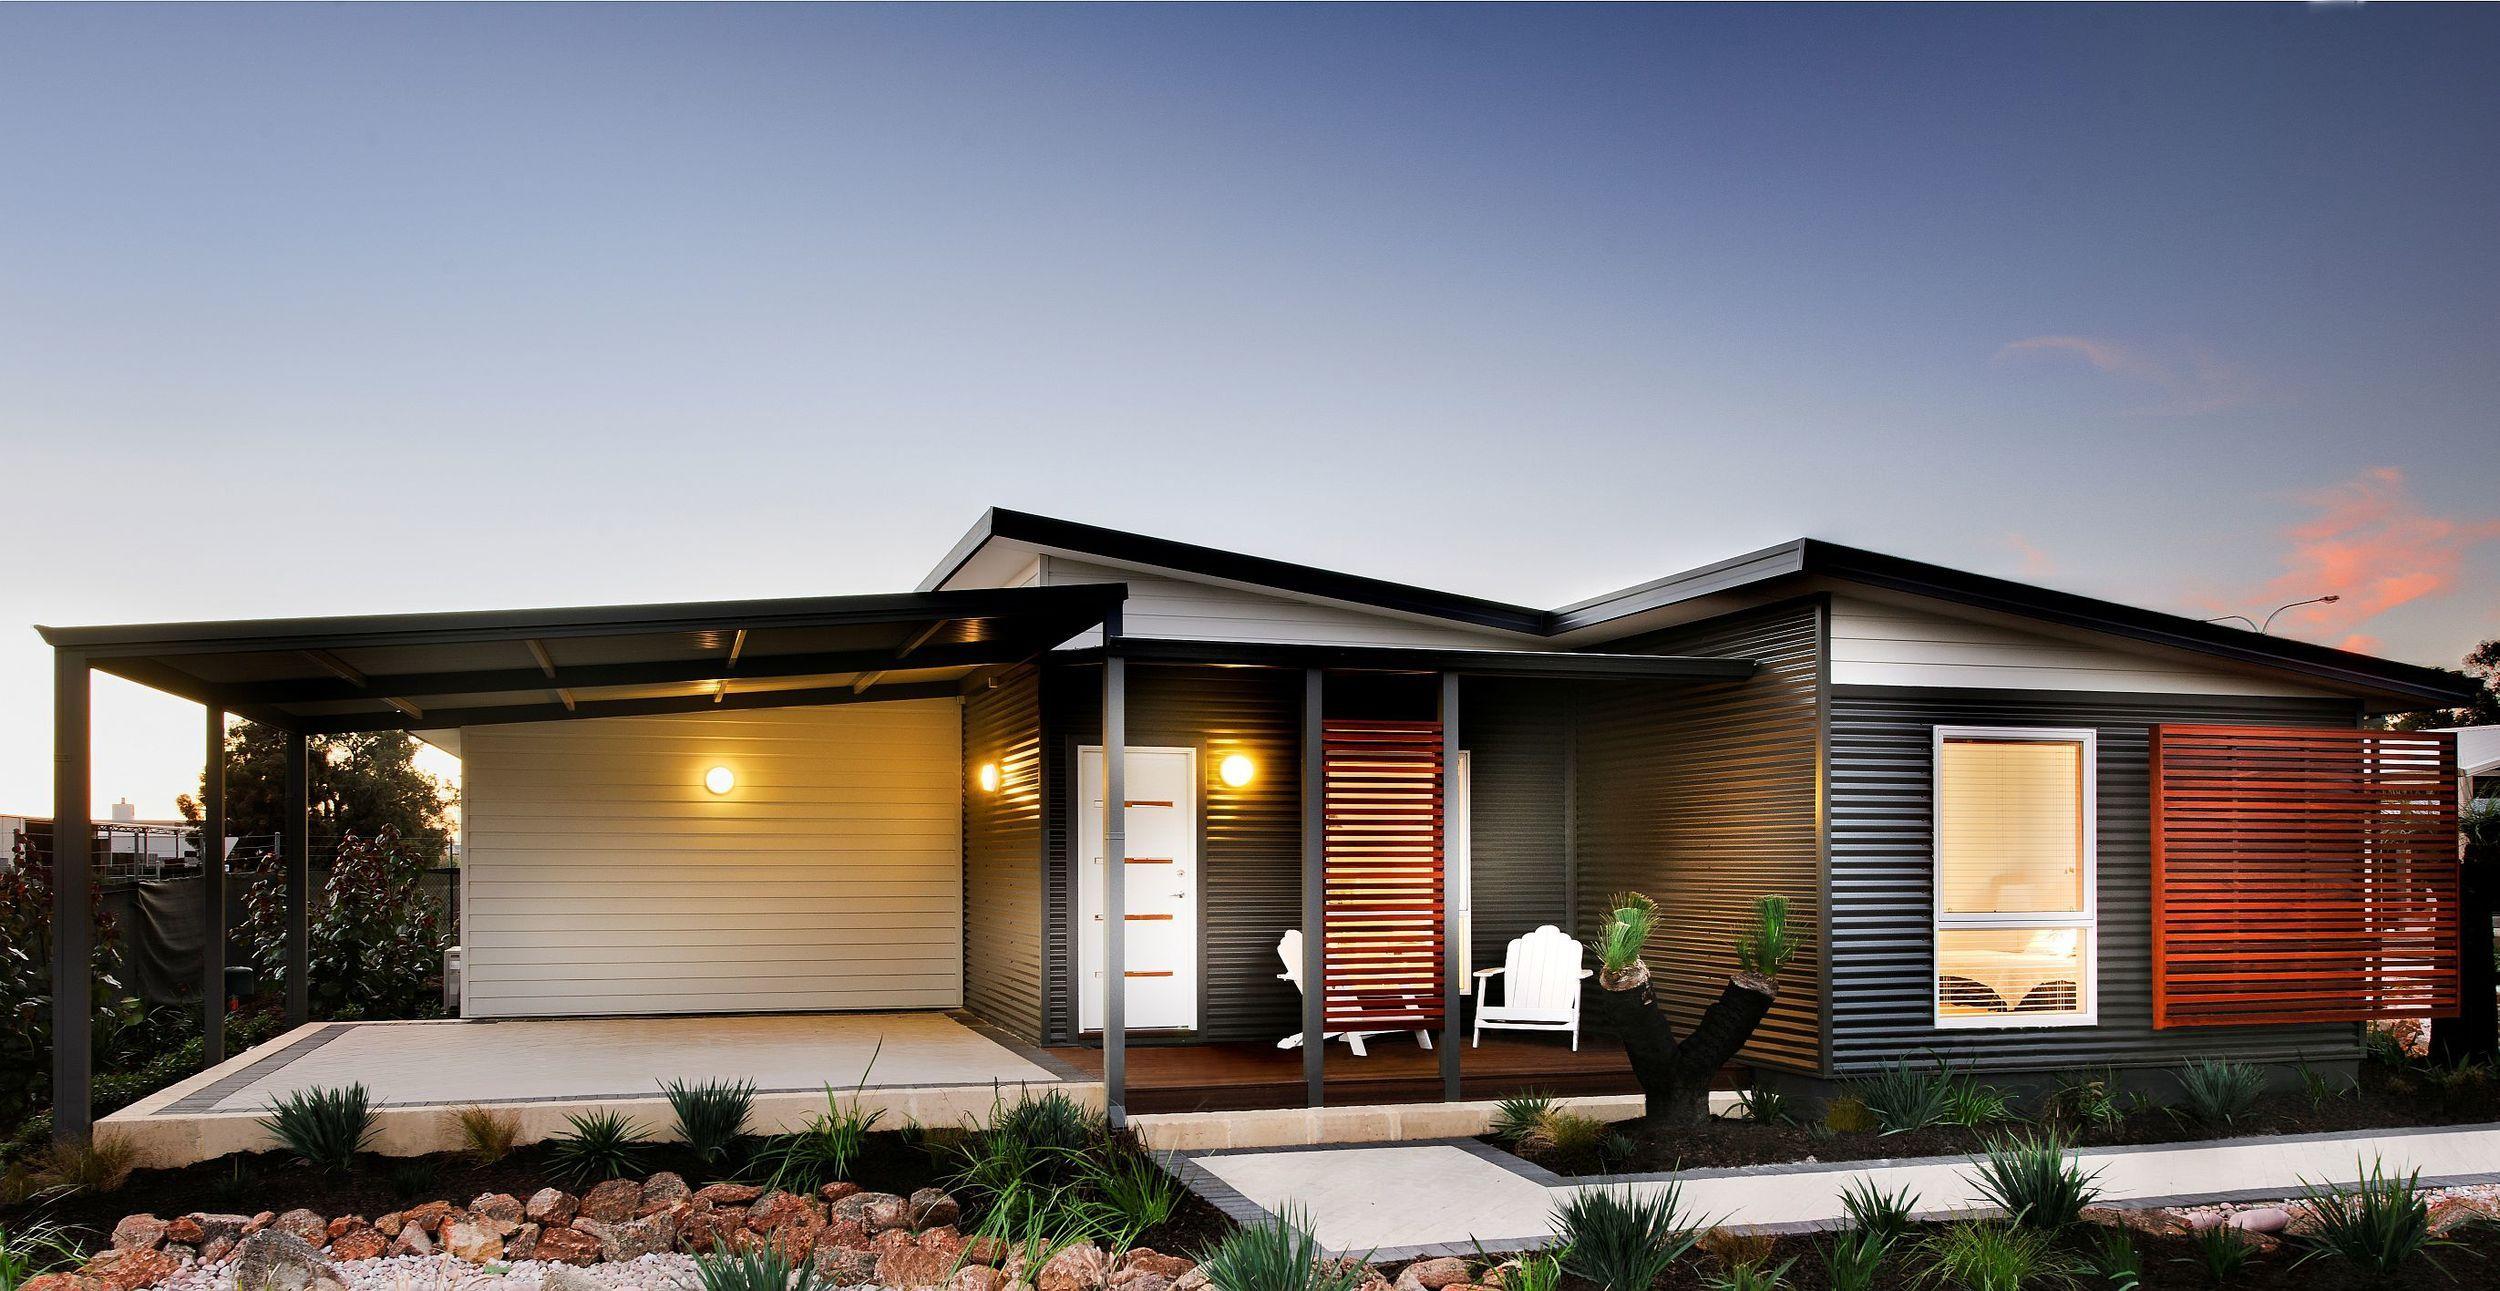 New Home Designs House Design Home